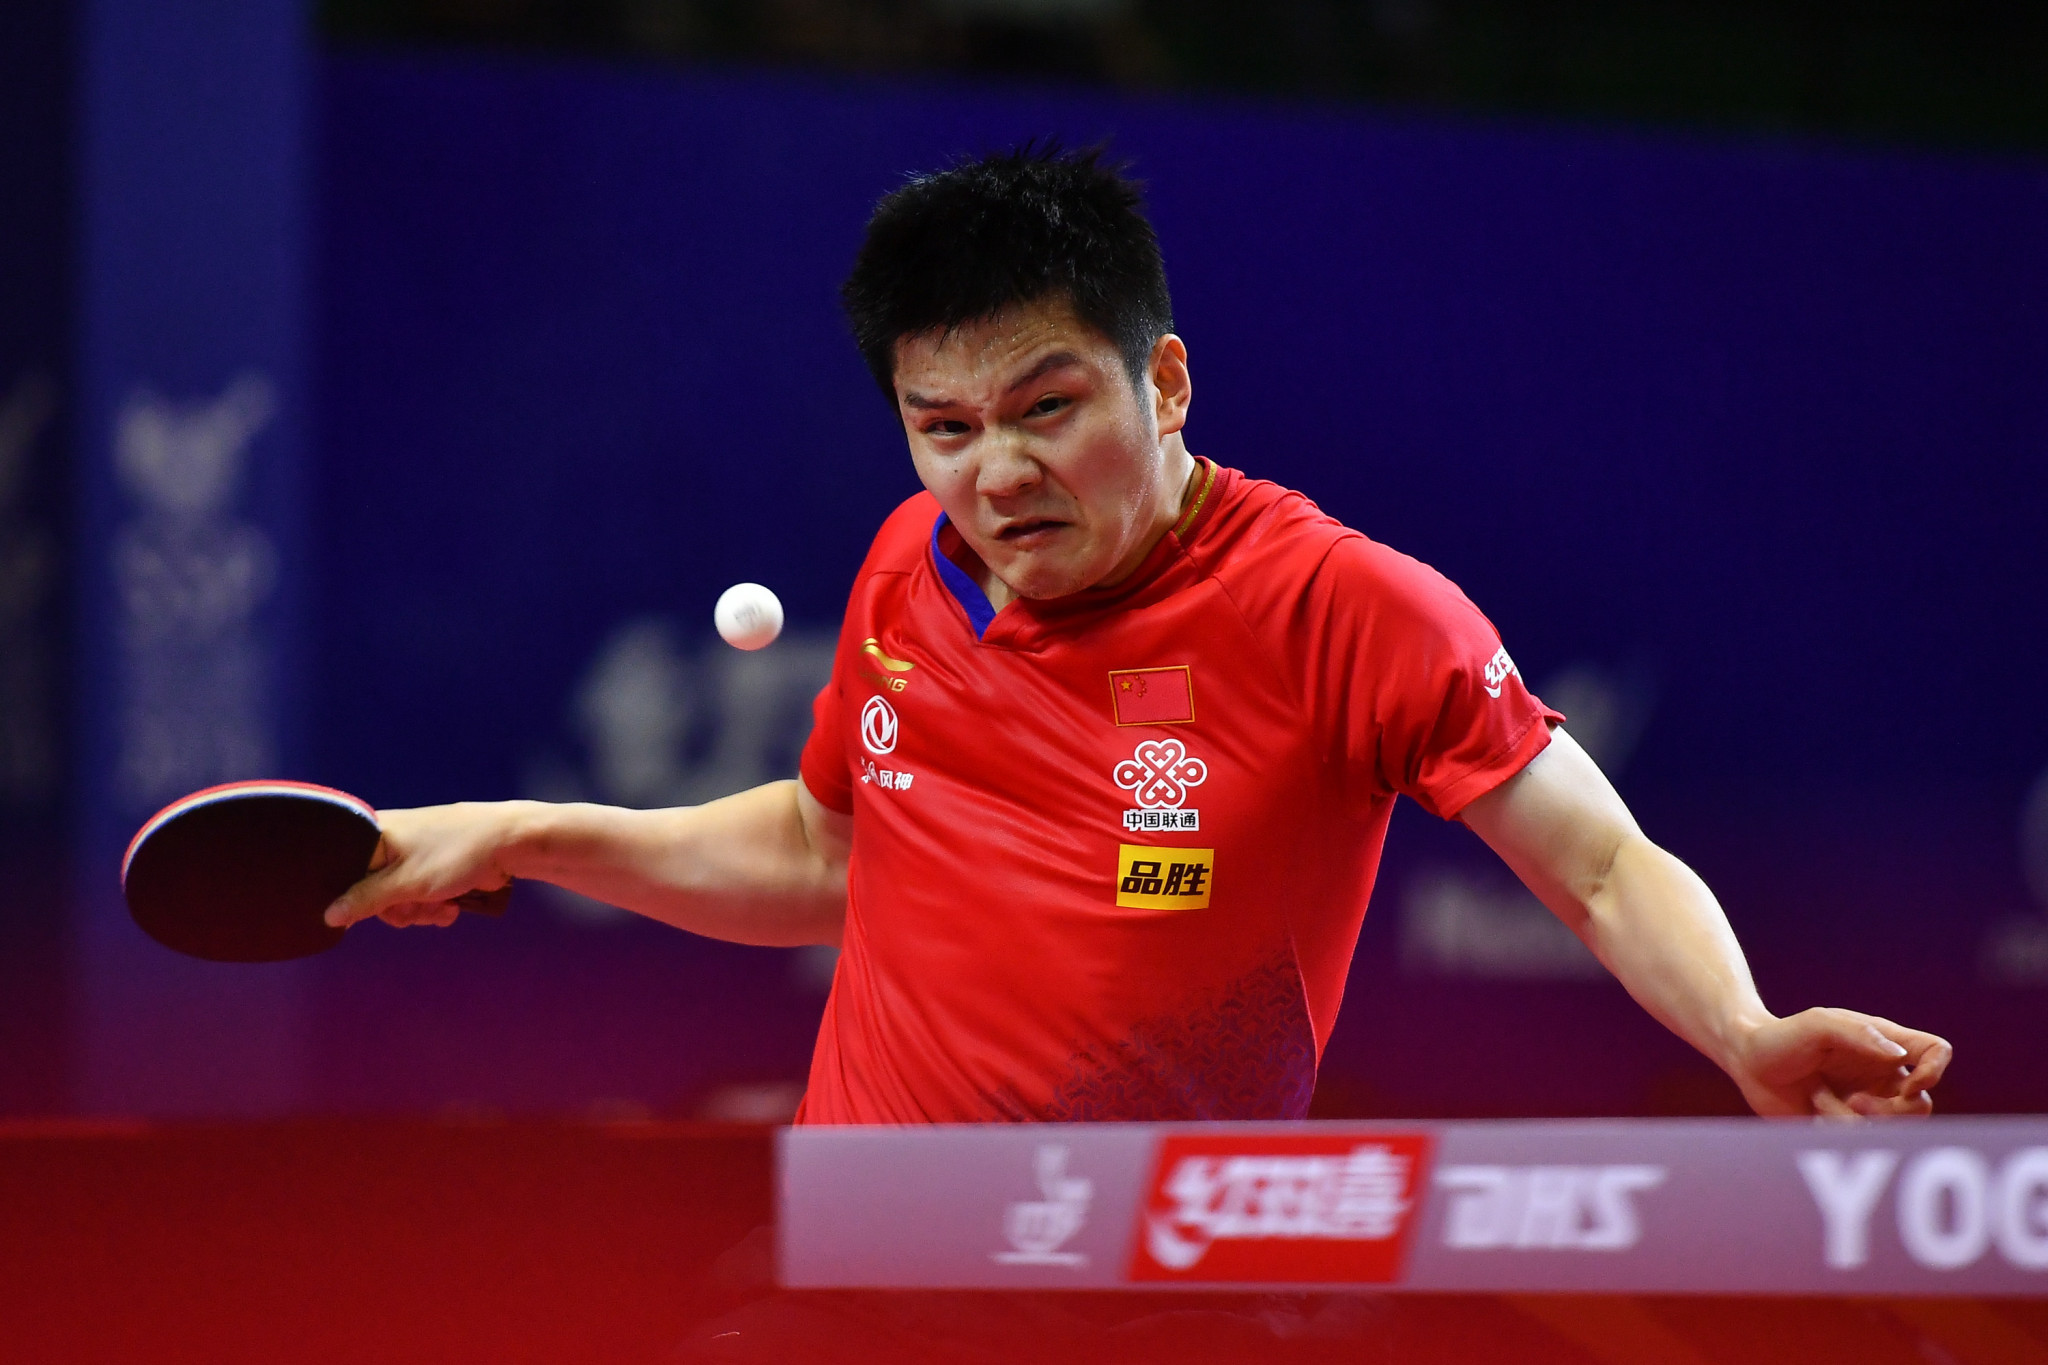 Fan eyeing Swedish Open history at latest ITTF World Tour event